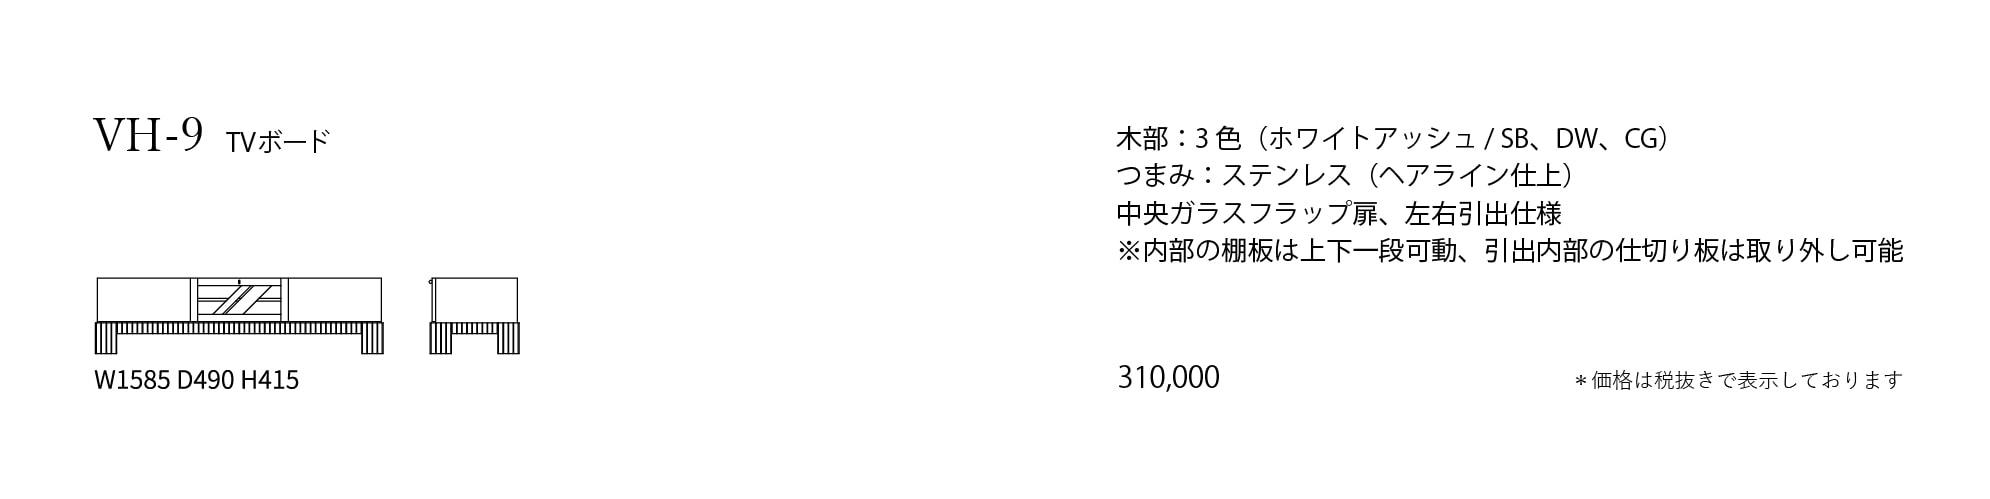 VH-9 Price List